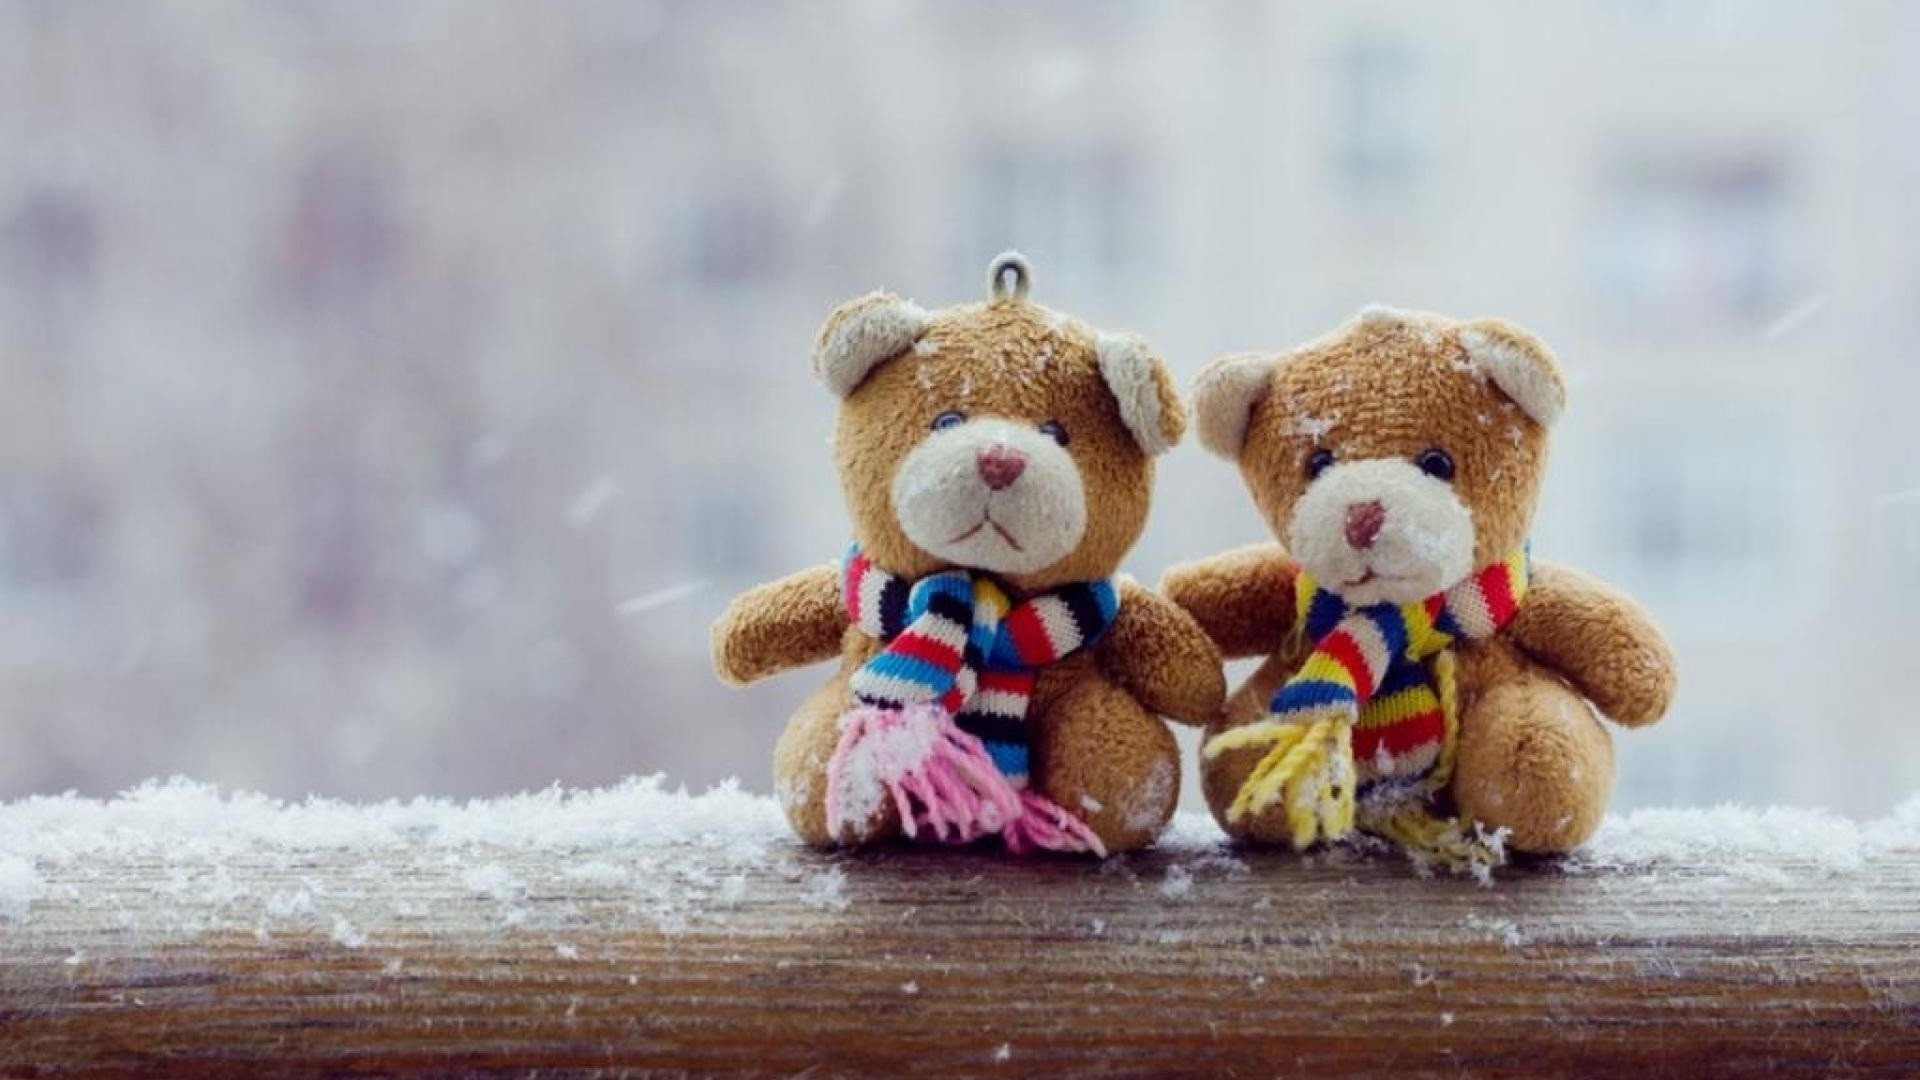 Teddy Bear a wallpaper